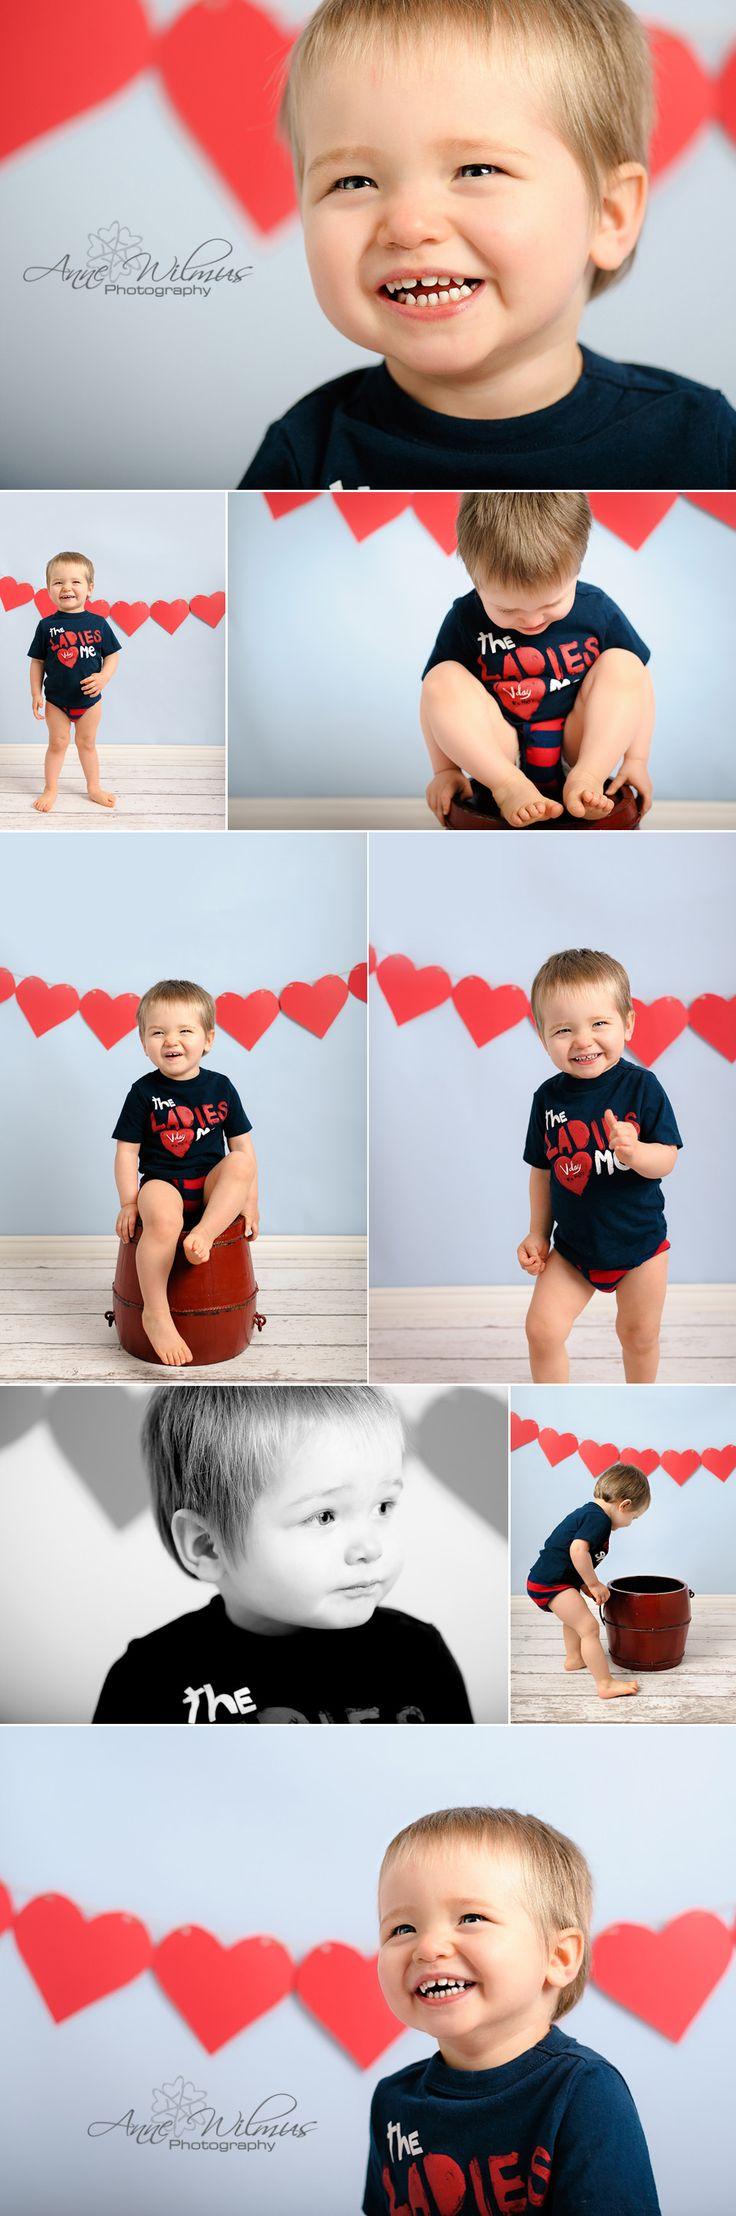 Best 25 Baby Photographer Ideas On Pinterest Born Baby